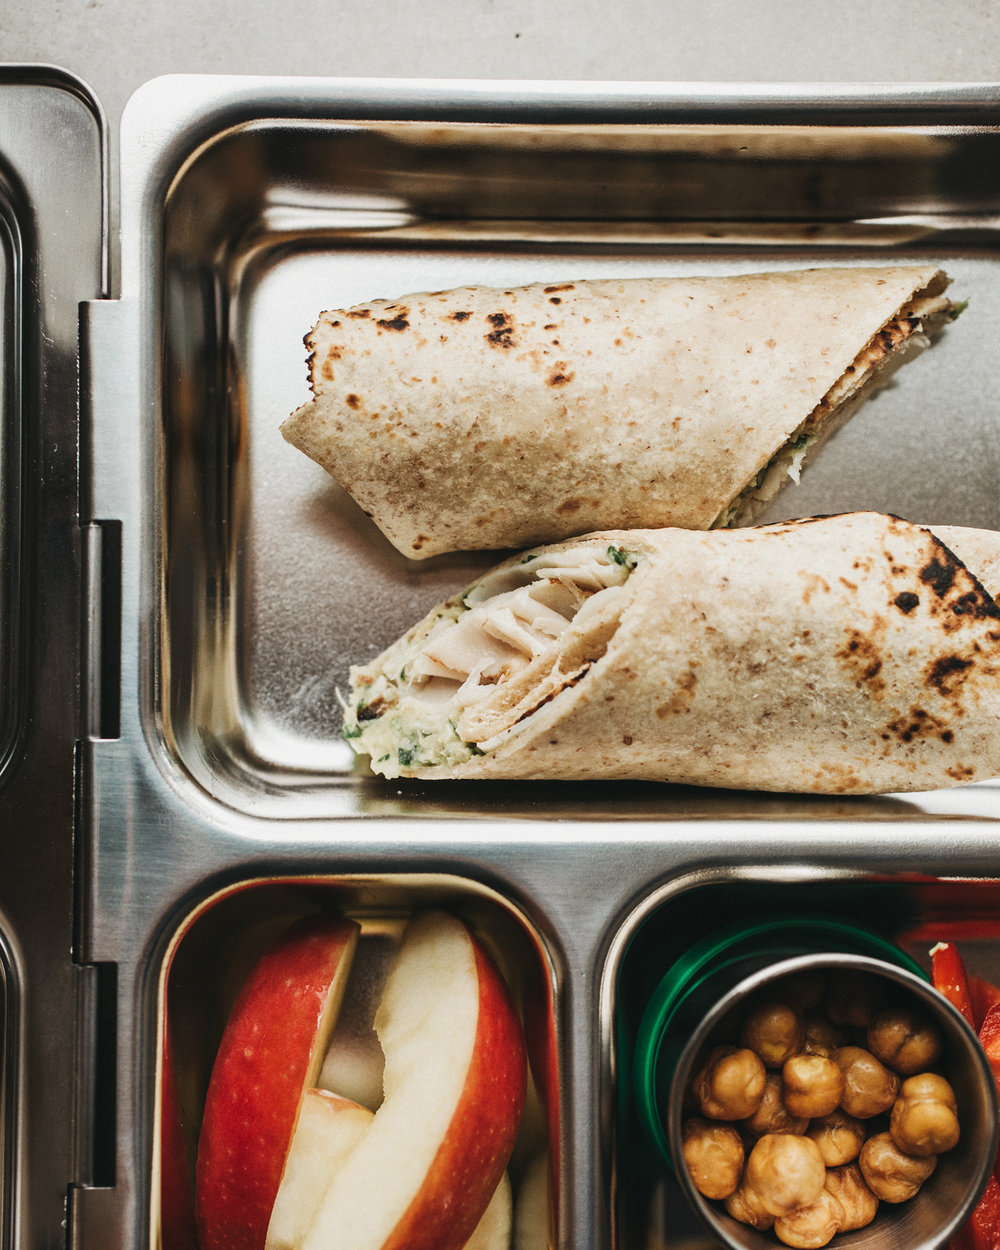 lunchbox_11.jpg